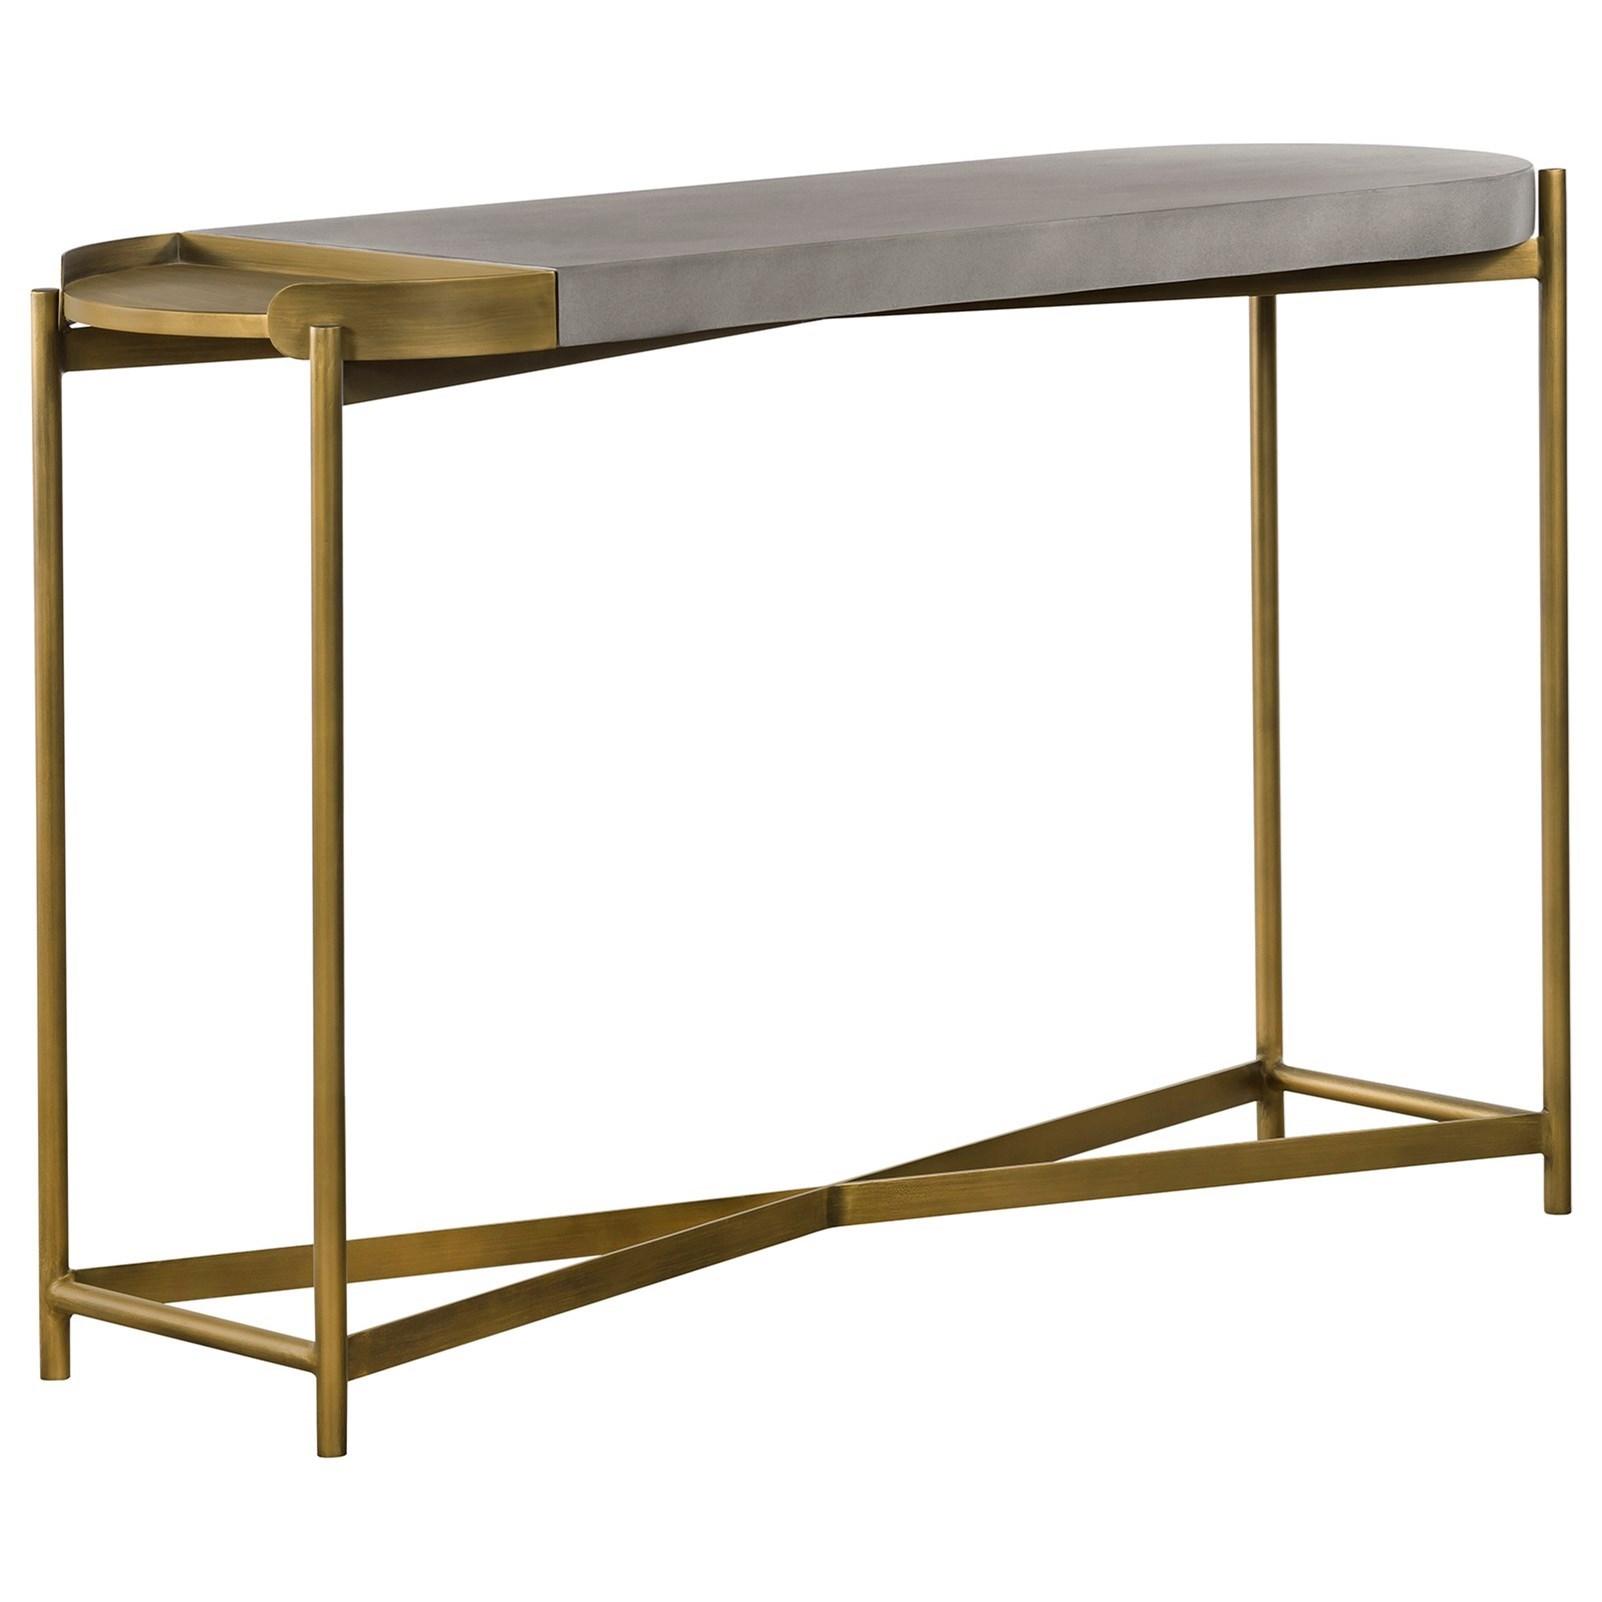 Dua Concrete Console Table at Sadler's Home Furnishings